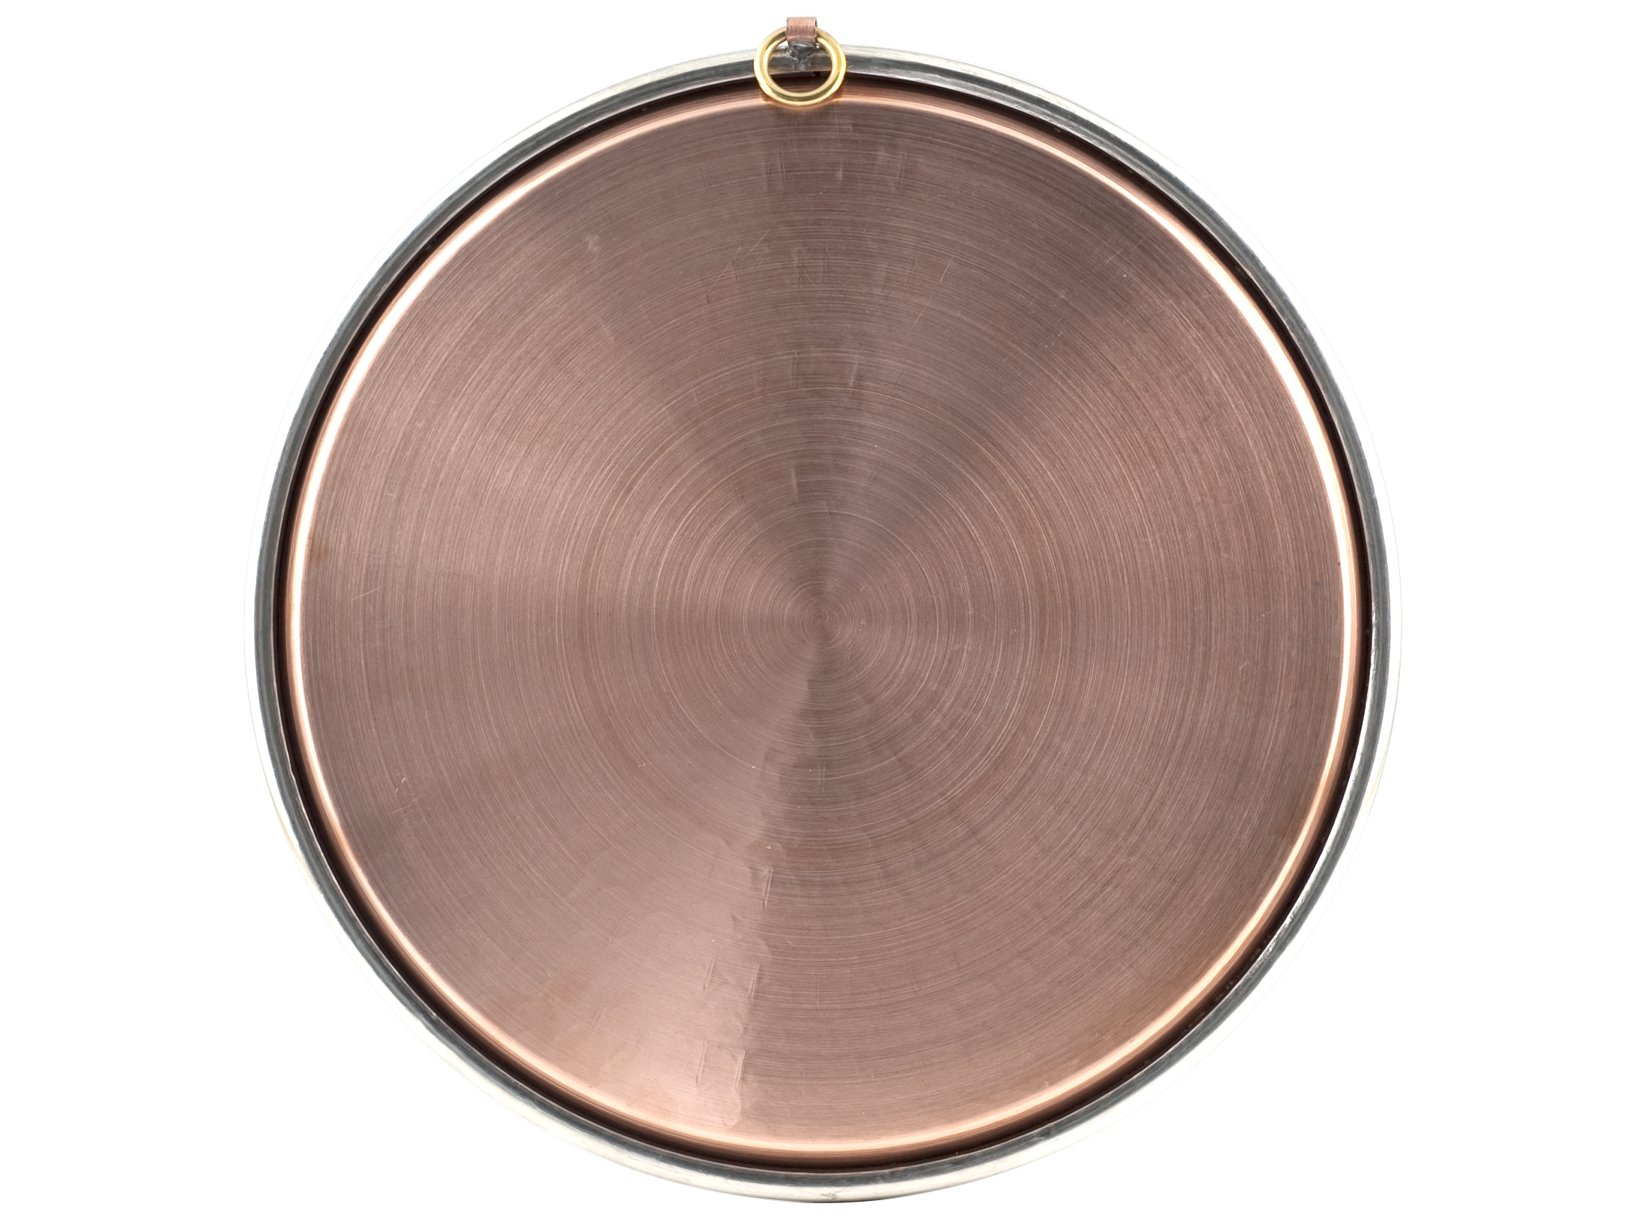 Baking pan in tinned copper cm. 37